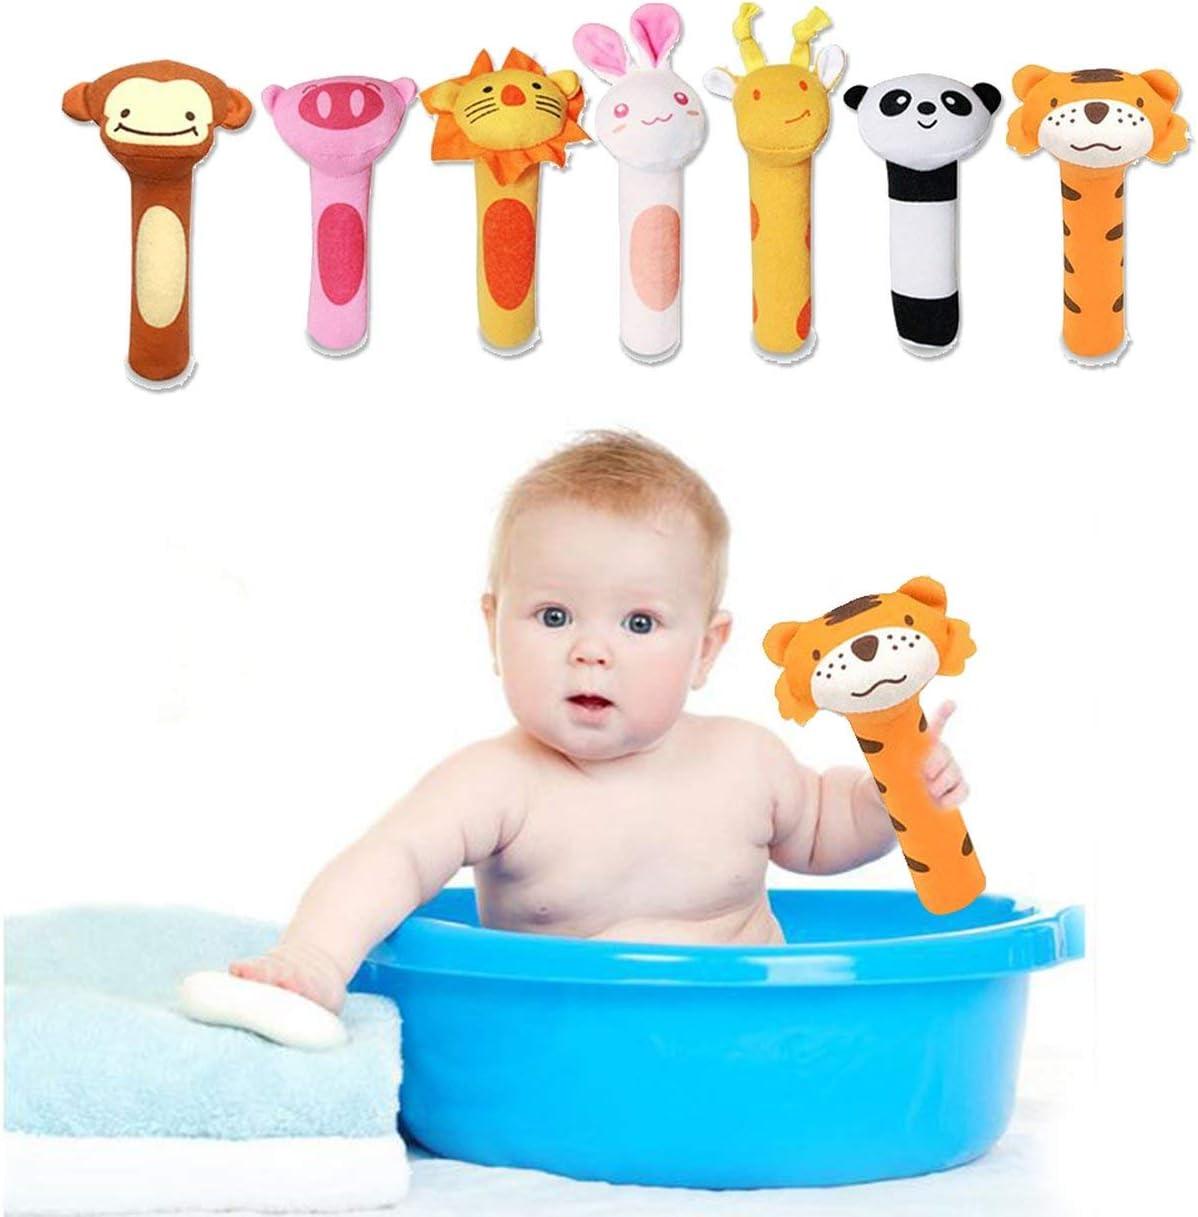 Lorenlli BB Stick Baby Toy Plush Hand Rattle BB Stick Animal BB Stick Hand Rattle Baby Hand Fleece Rattle